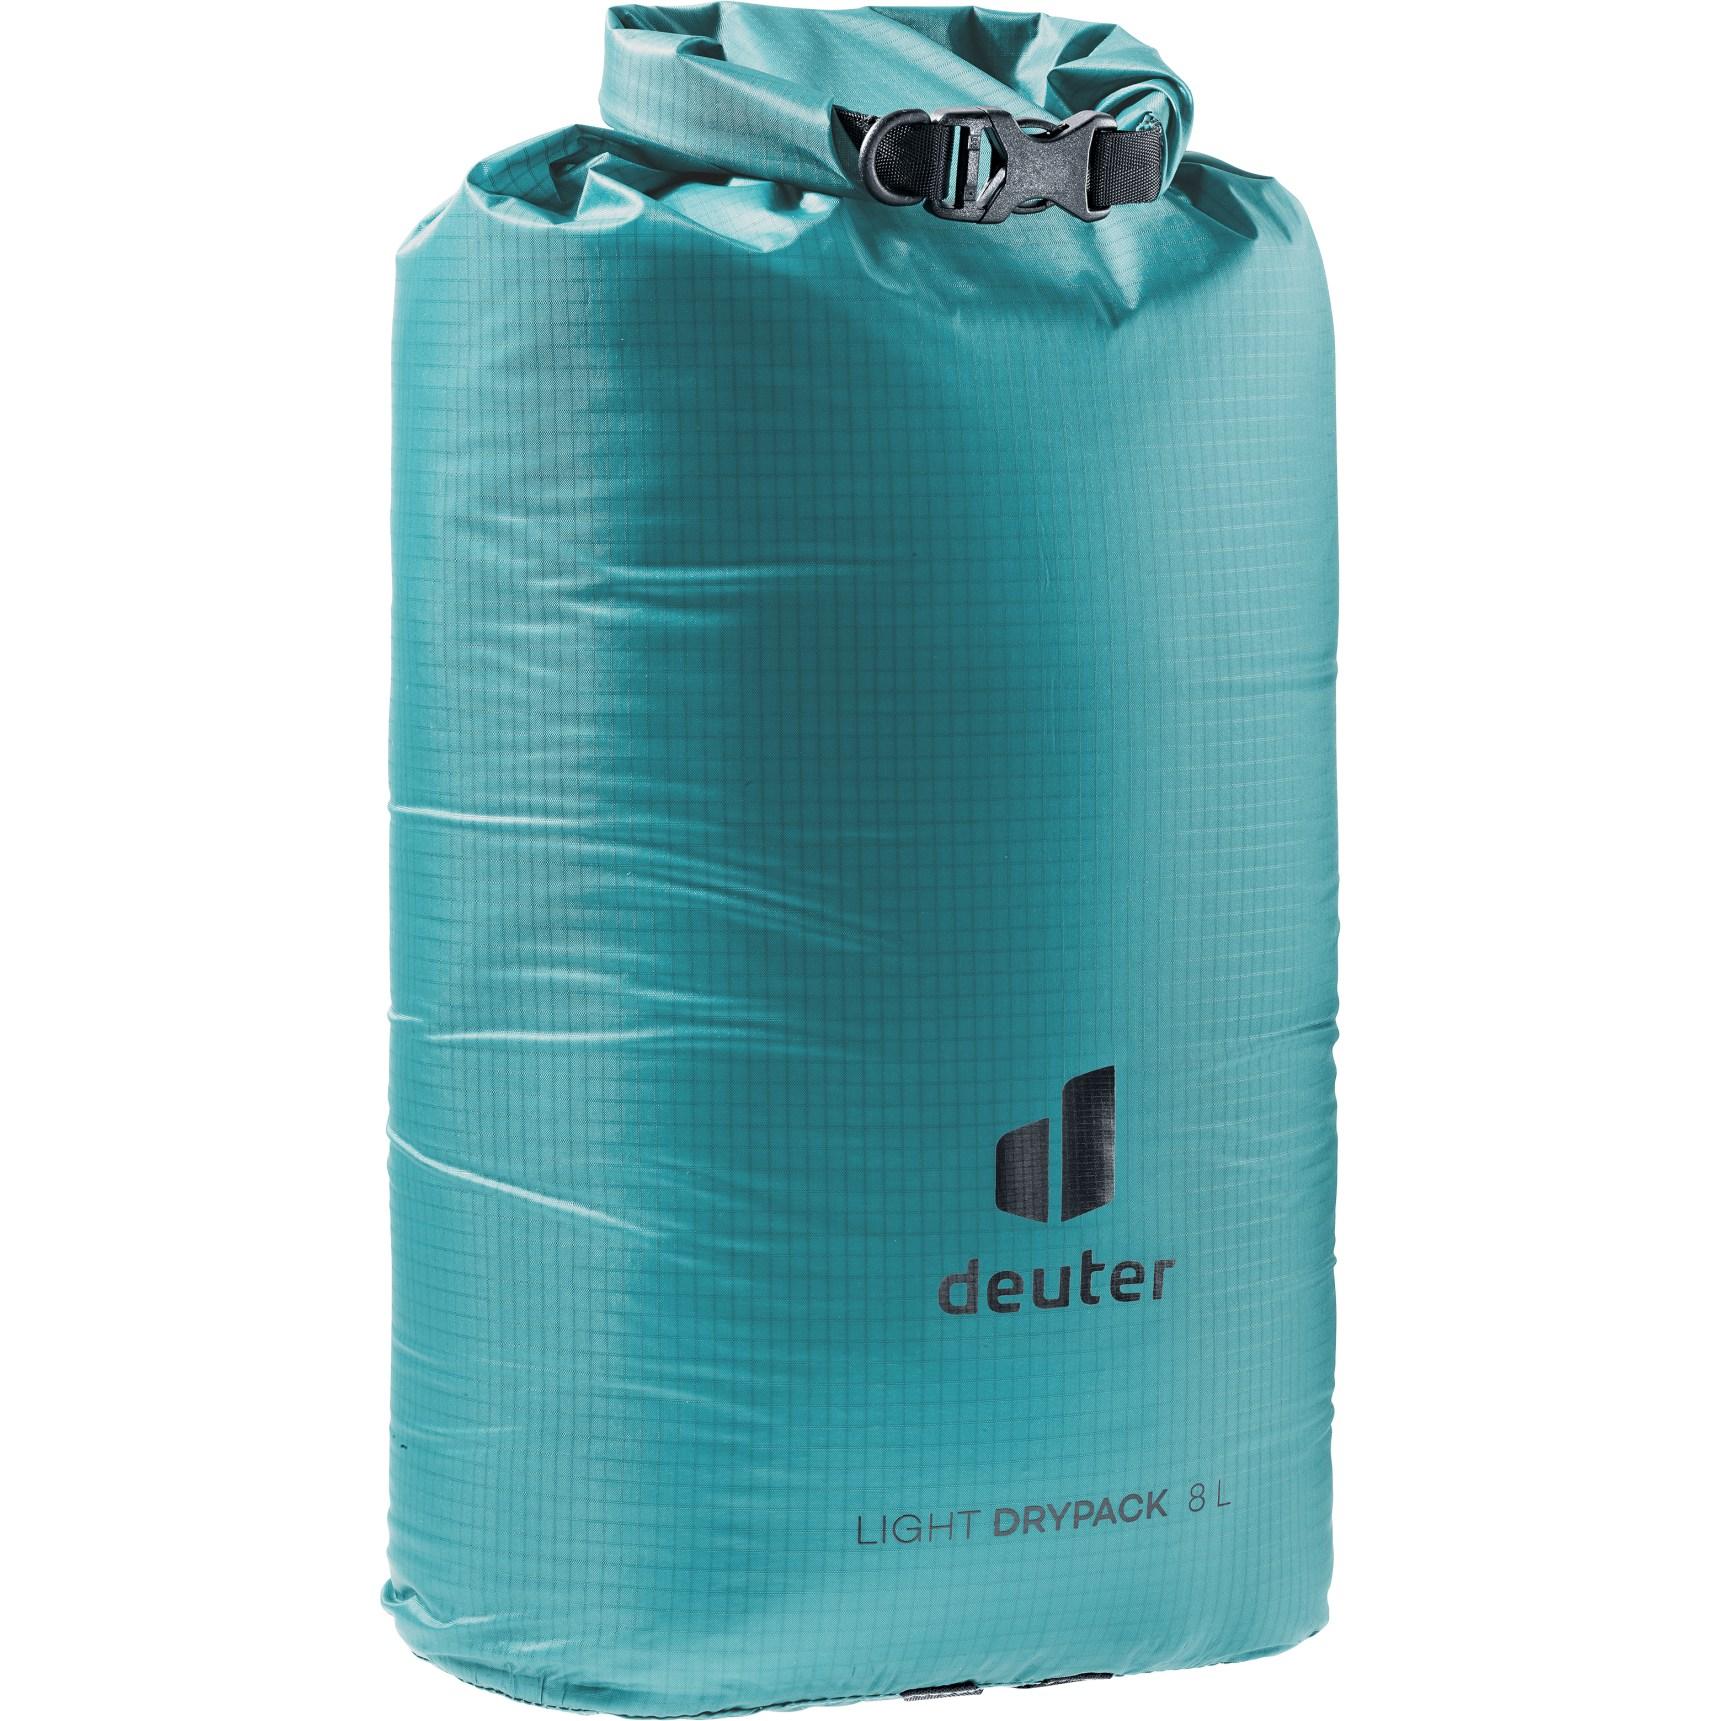 Deuter Light Drypack 8l - petrol